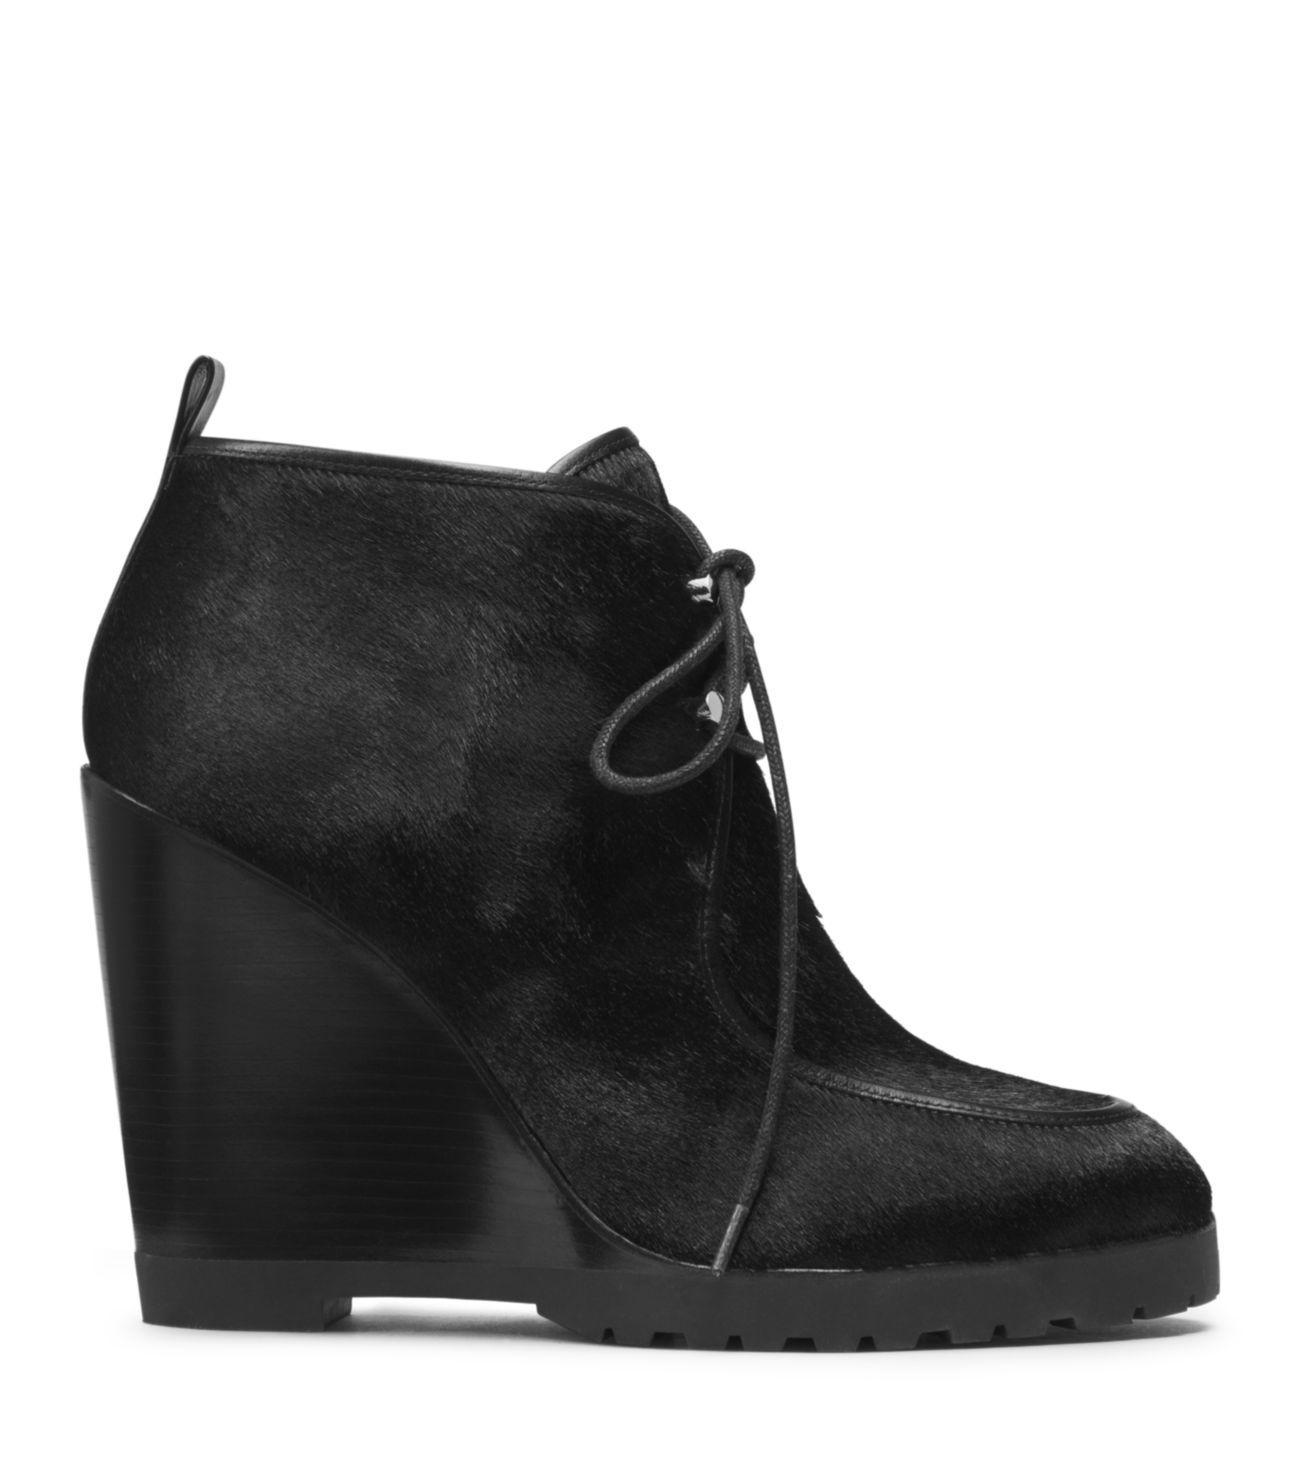 Michael Kors Beth Ankle Boot in Black